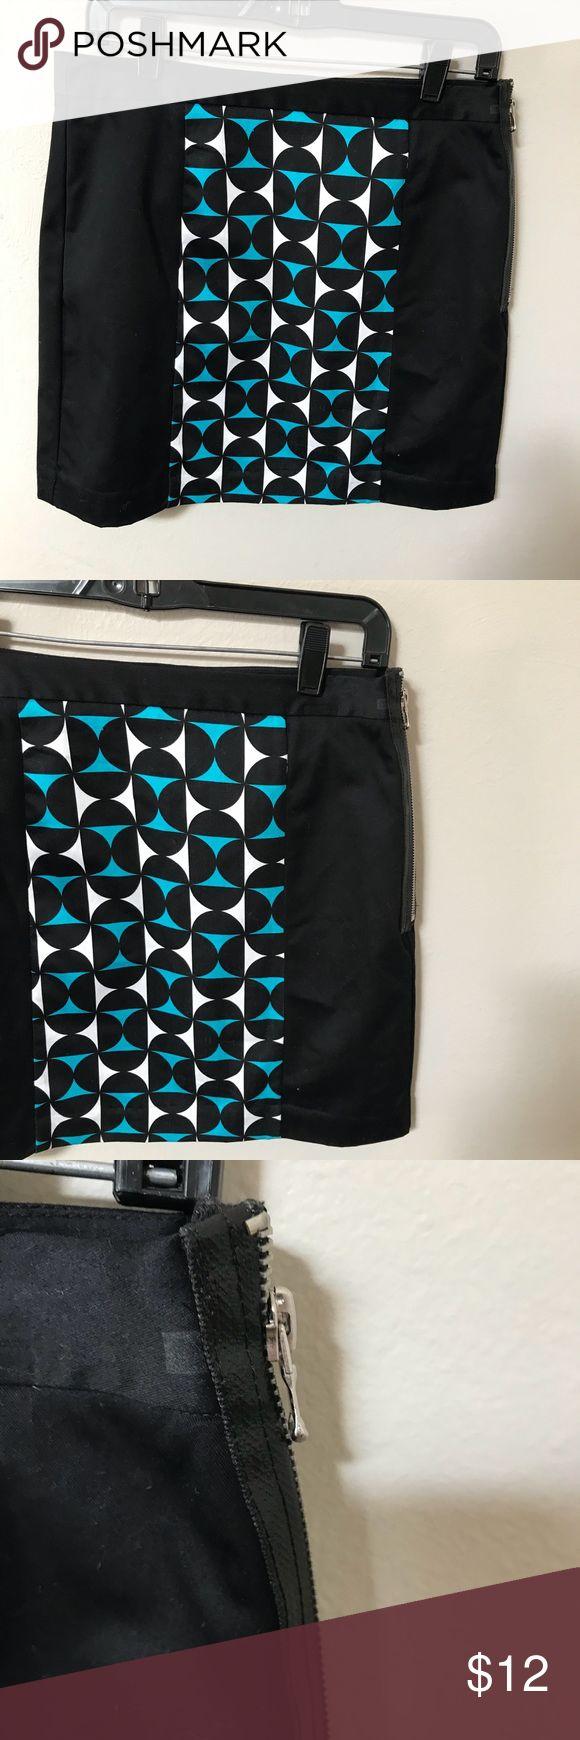 "Worthington mod print skirt Worthington mod print skirt zips up the side, lined.  Bright black with a fun mod print.  Measures 17"" long and 15"" flat across the waist. Cotton blend Worthington Skirts Midi"